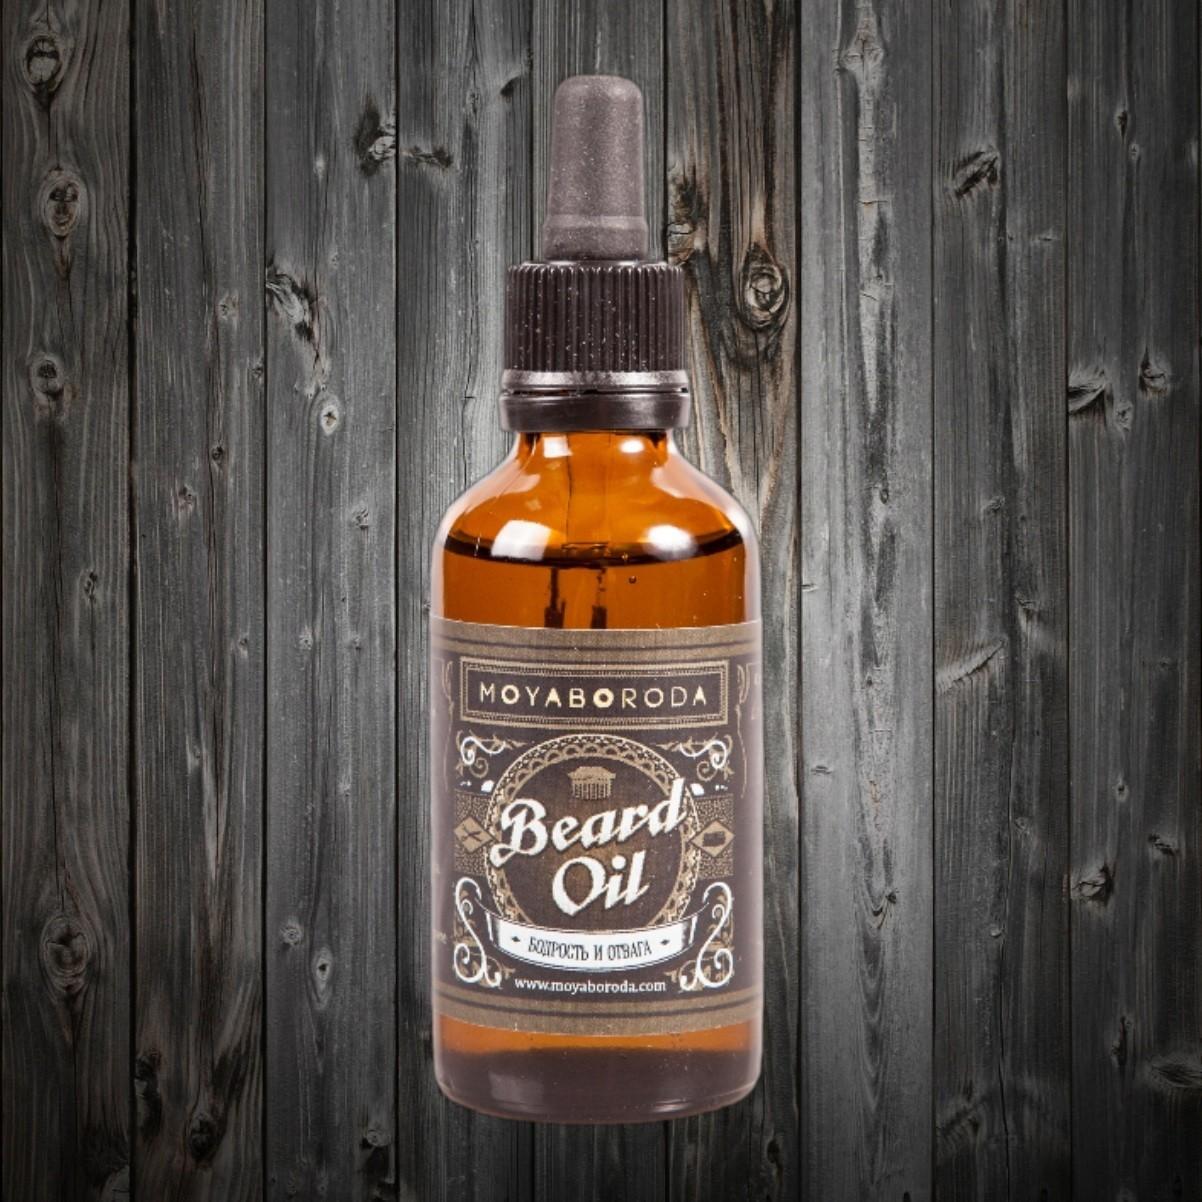 Moyaboroda Масло для бороды «Бодрость и отвага» (Beard Oil «Cheerfulness and courage») 50 ml